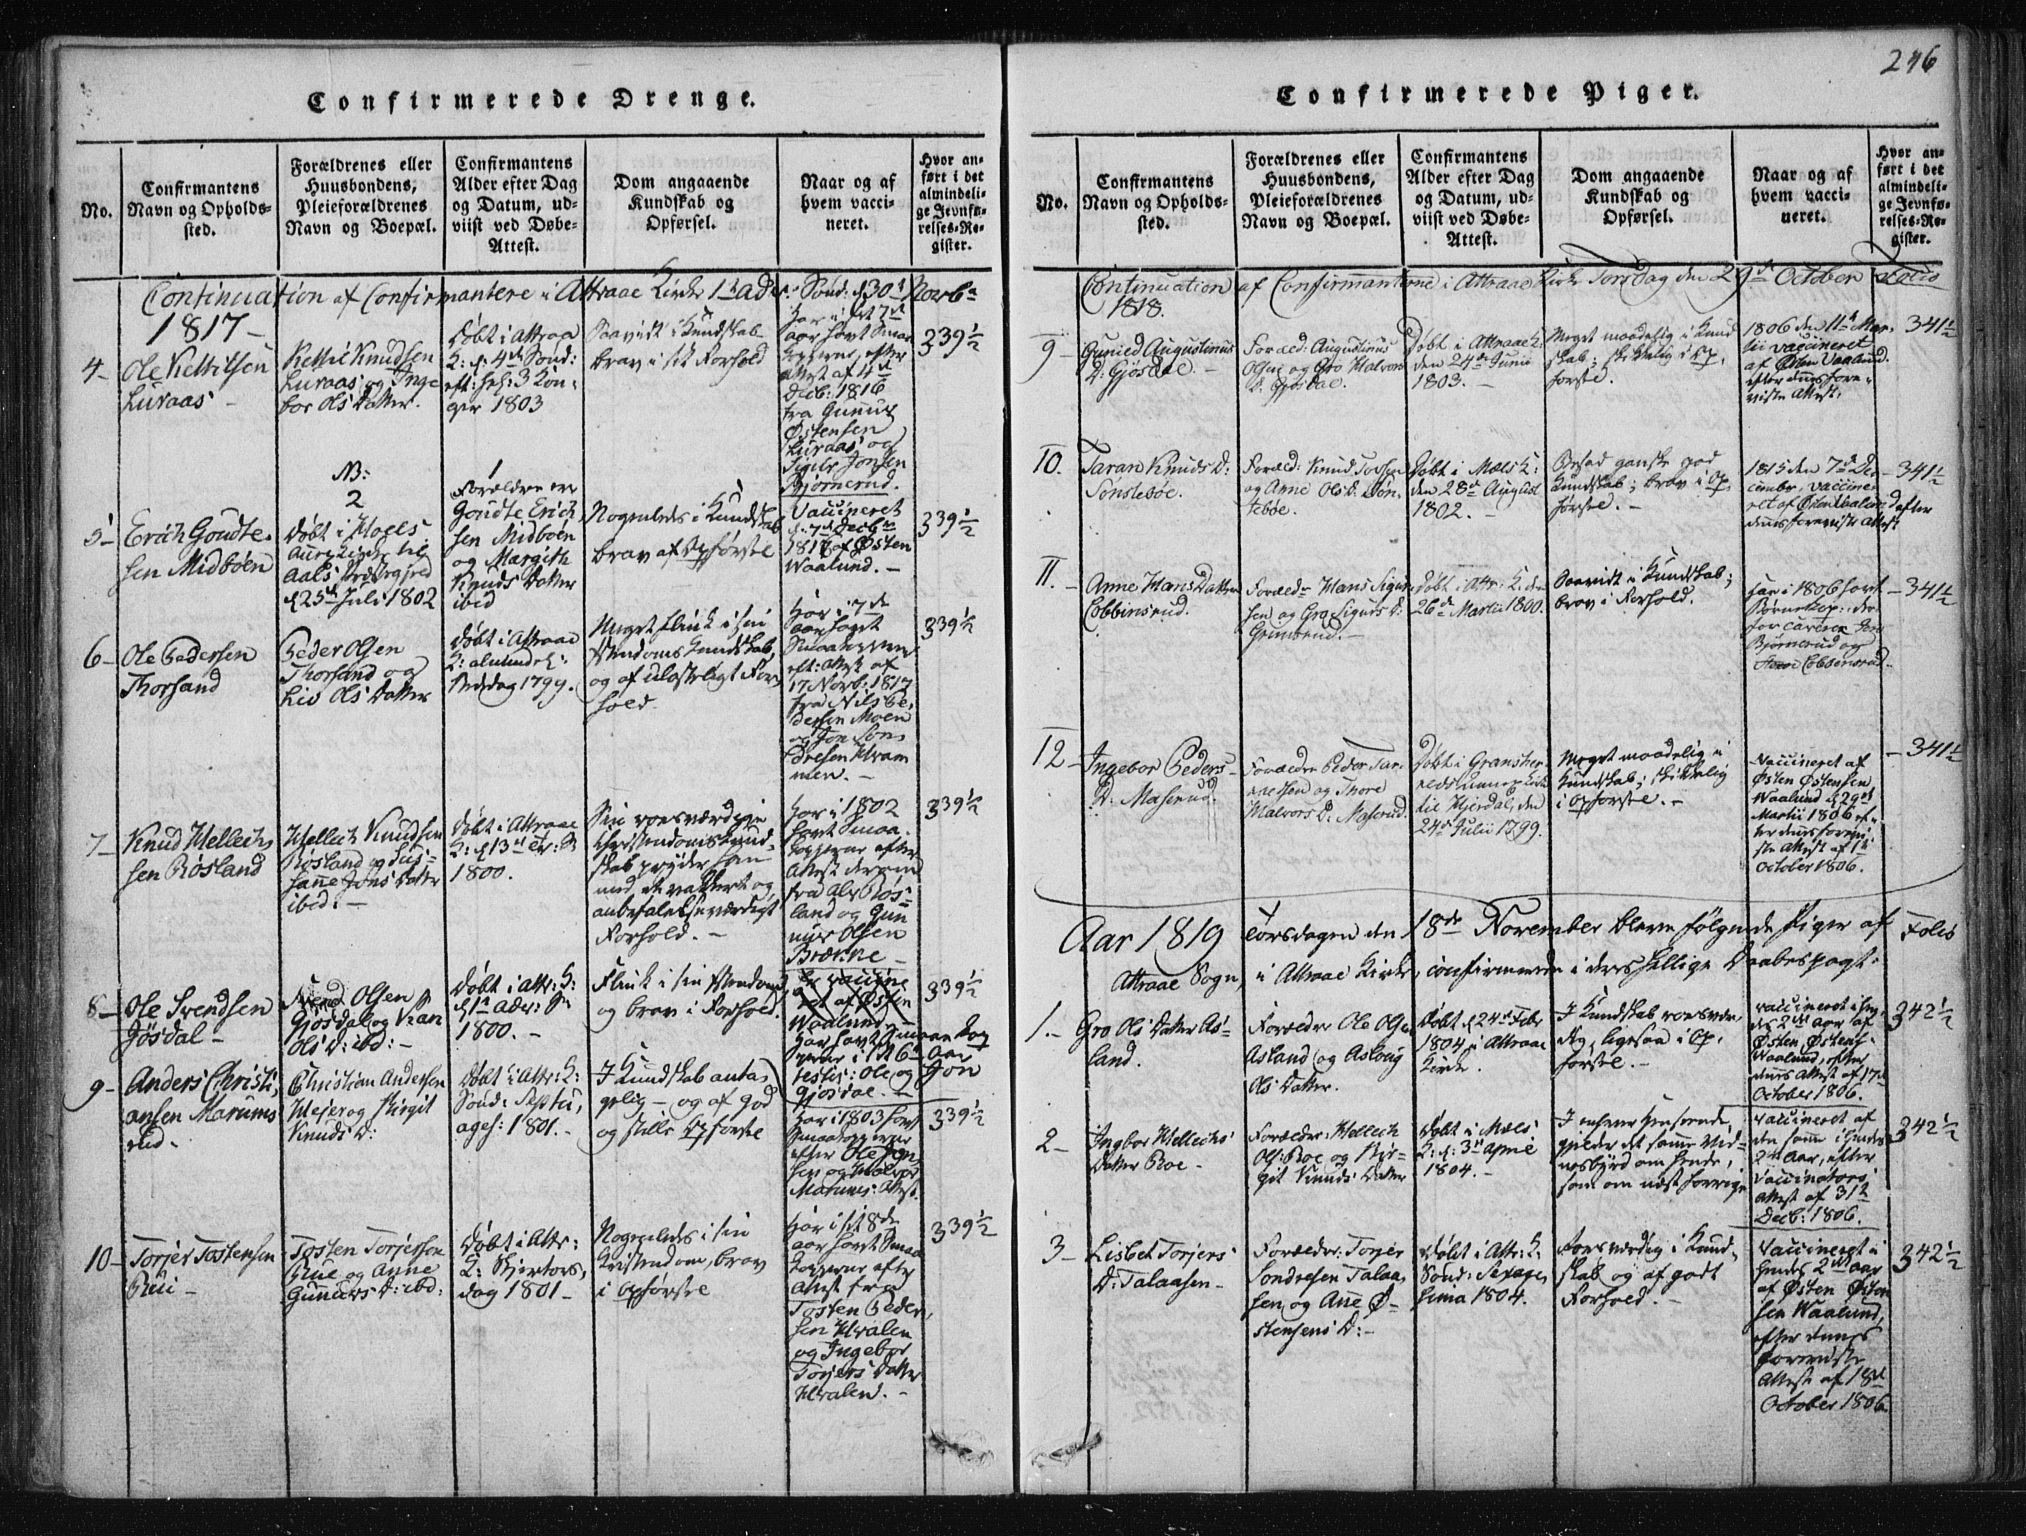 SAKO, Tinn kirkebøker, F/Fa/L0004: Ministerialbok nr. I 4, 1815-1843, s. 246